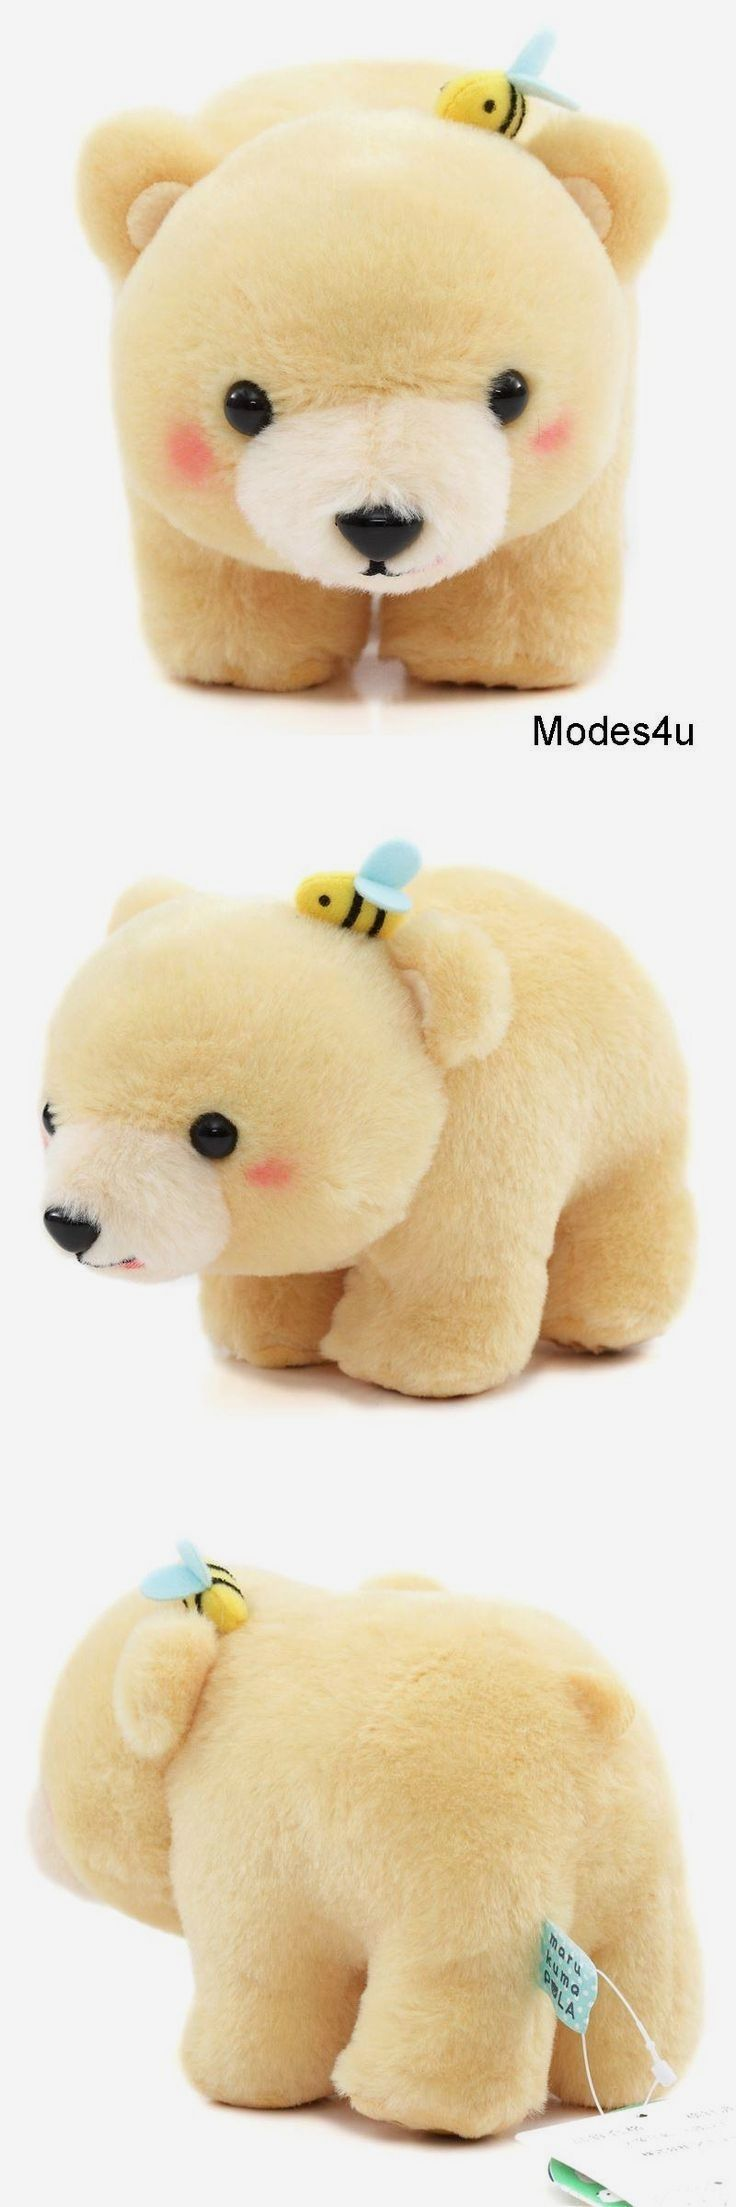 Amazing Savings On Small Animal Toys Cute Stuffed Animals Kawaii Plush Plush Stuffed Animals [ 2207 x 736 Pixel ]